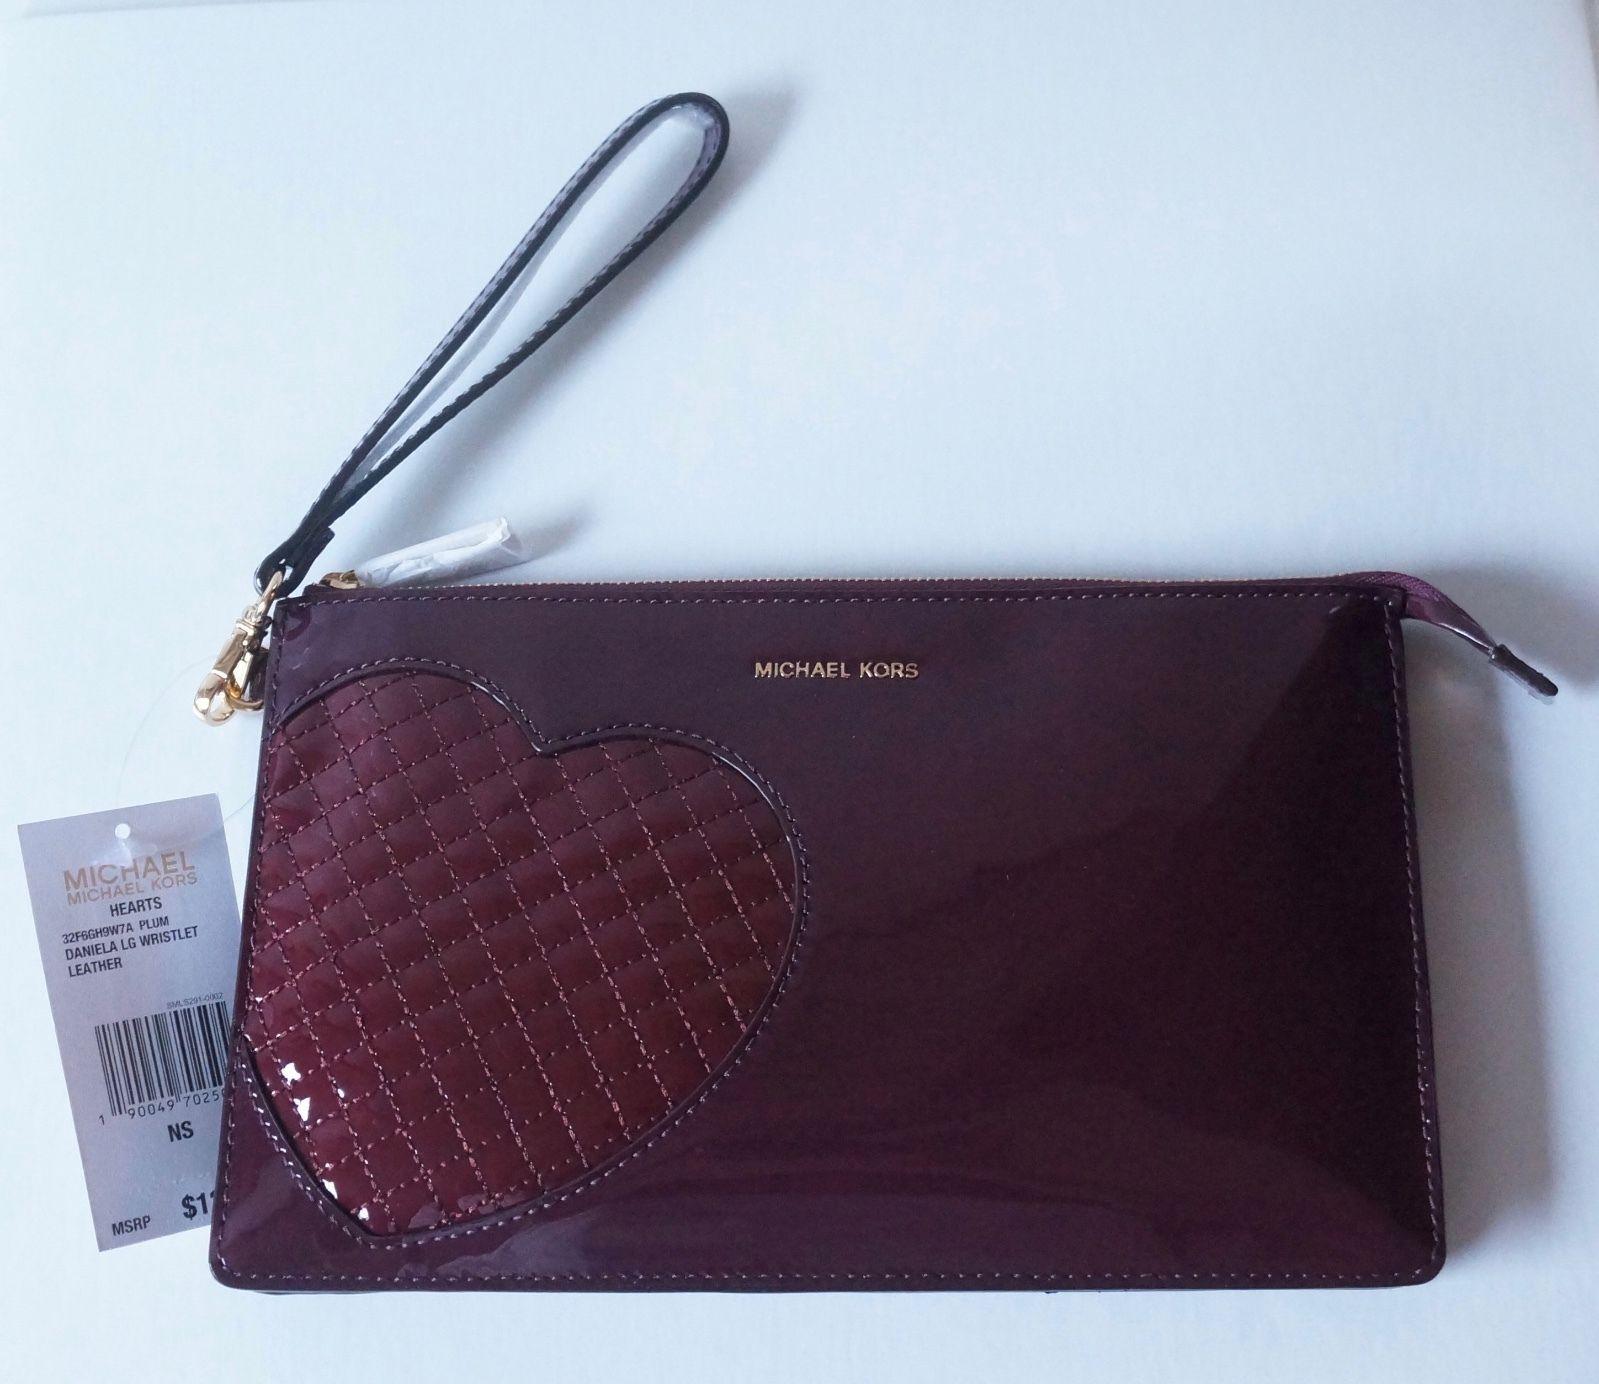 681ed0f7f6e2d Nwt Michael Kors Daniela Hearts Large Patent and 50 similar items. S l1600